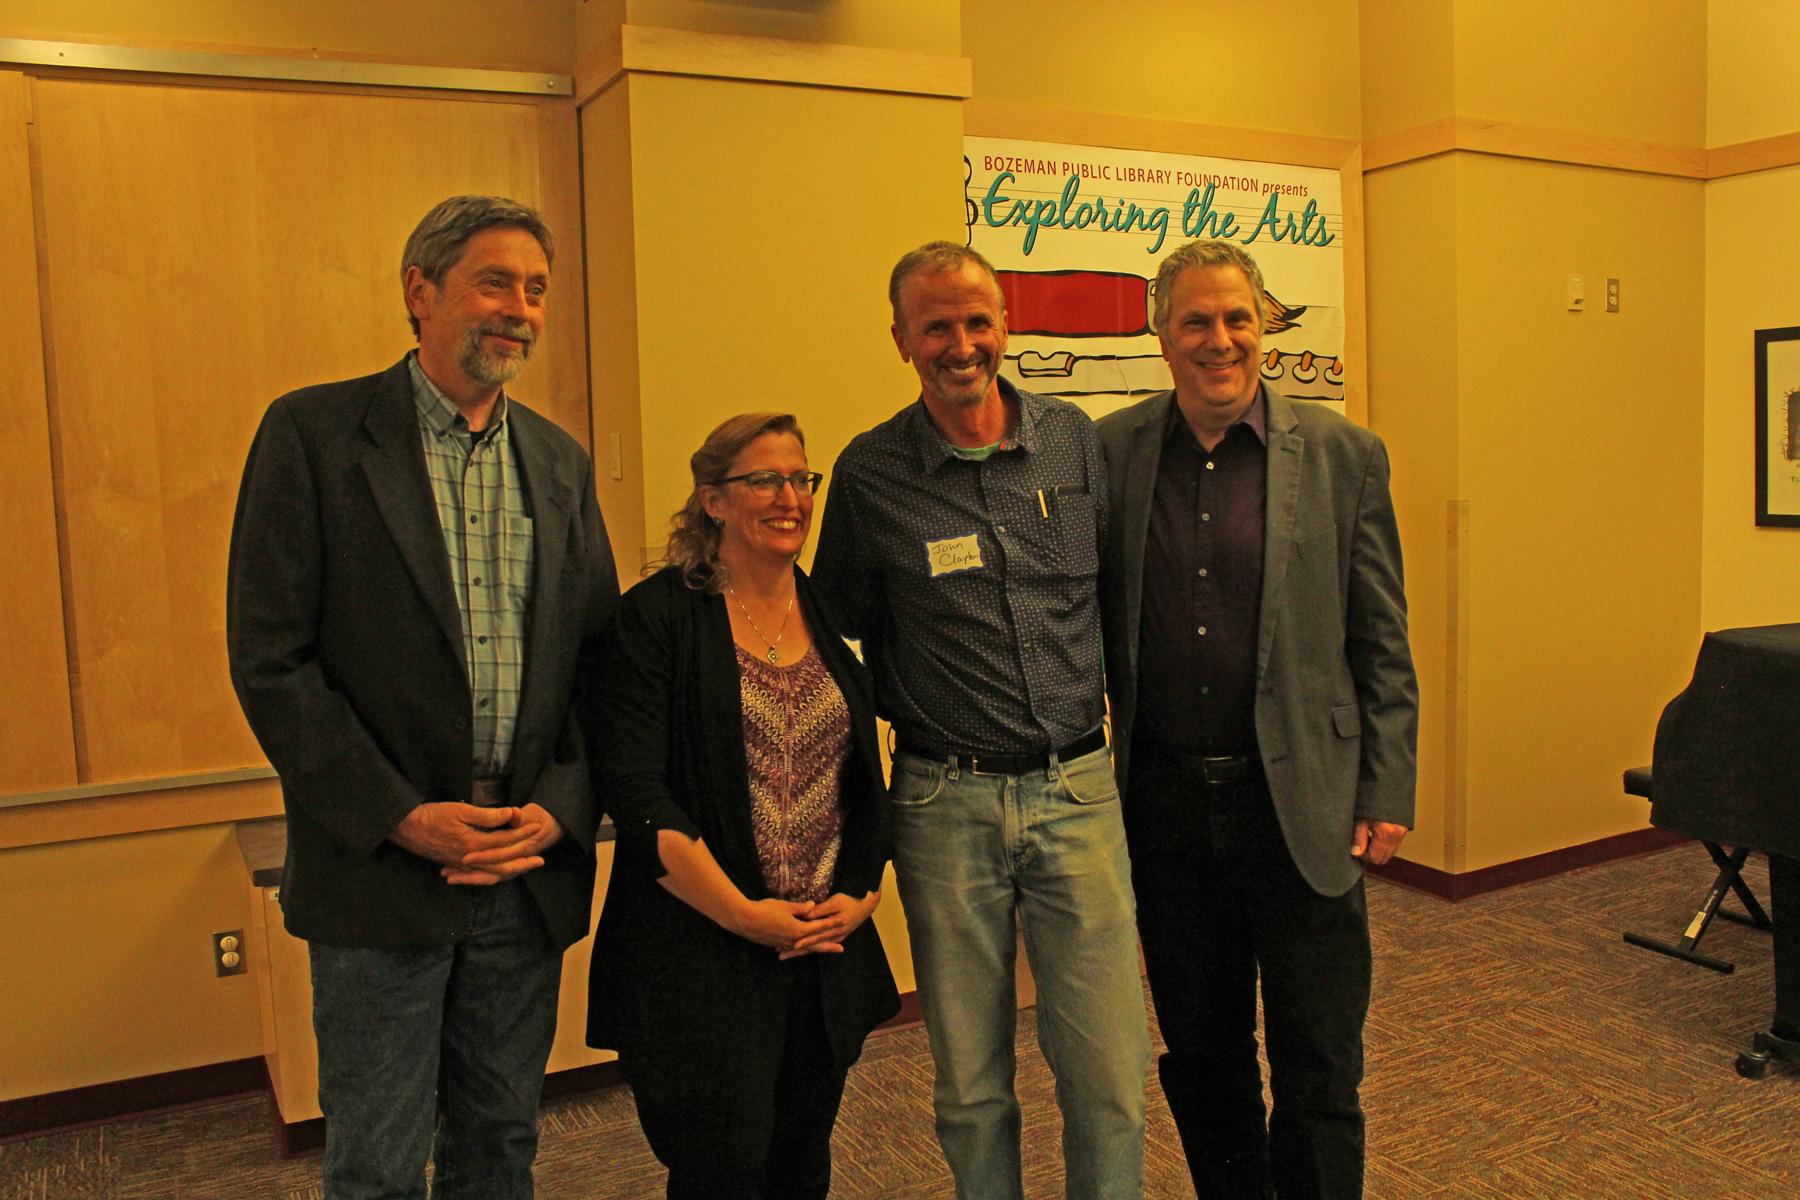 Jim Robbins, me, John Clayton, and David Abrams.